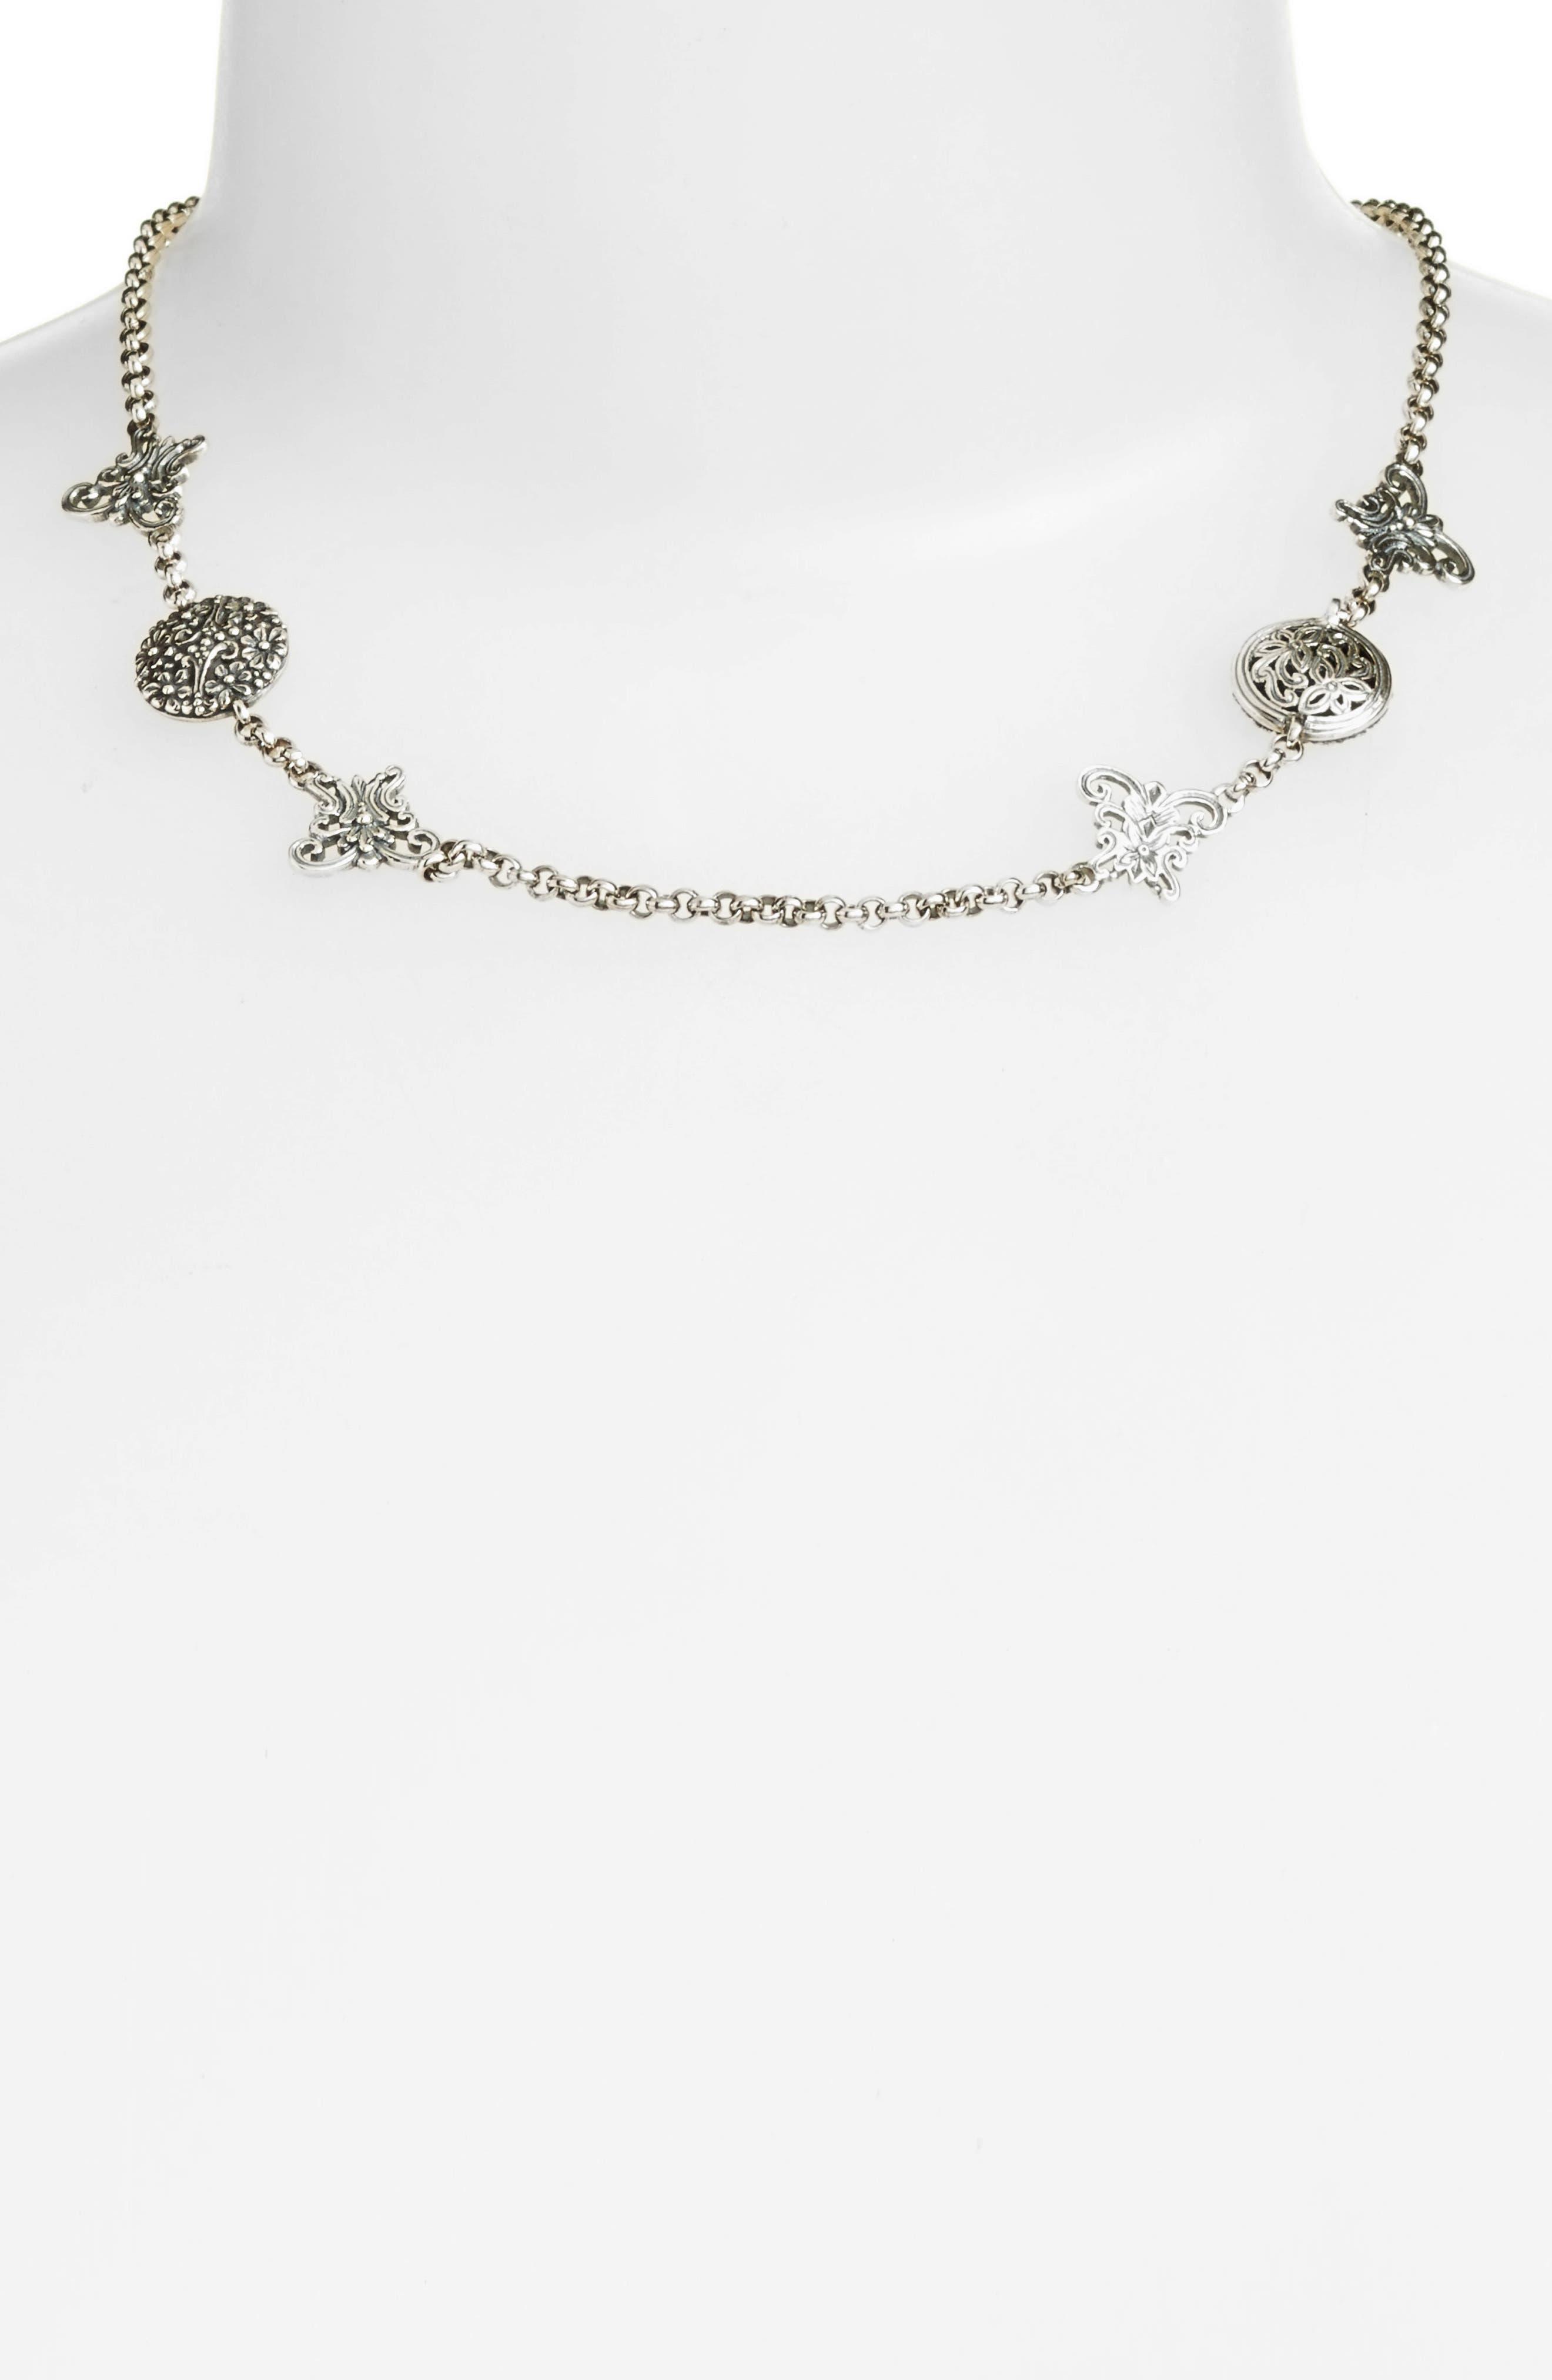 Santorini Butterfly Collar Necklace,                         Main,                         color, Silver/ Hematite